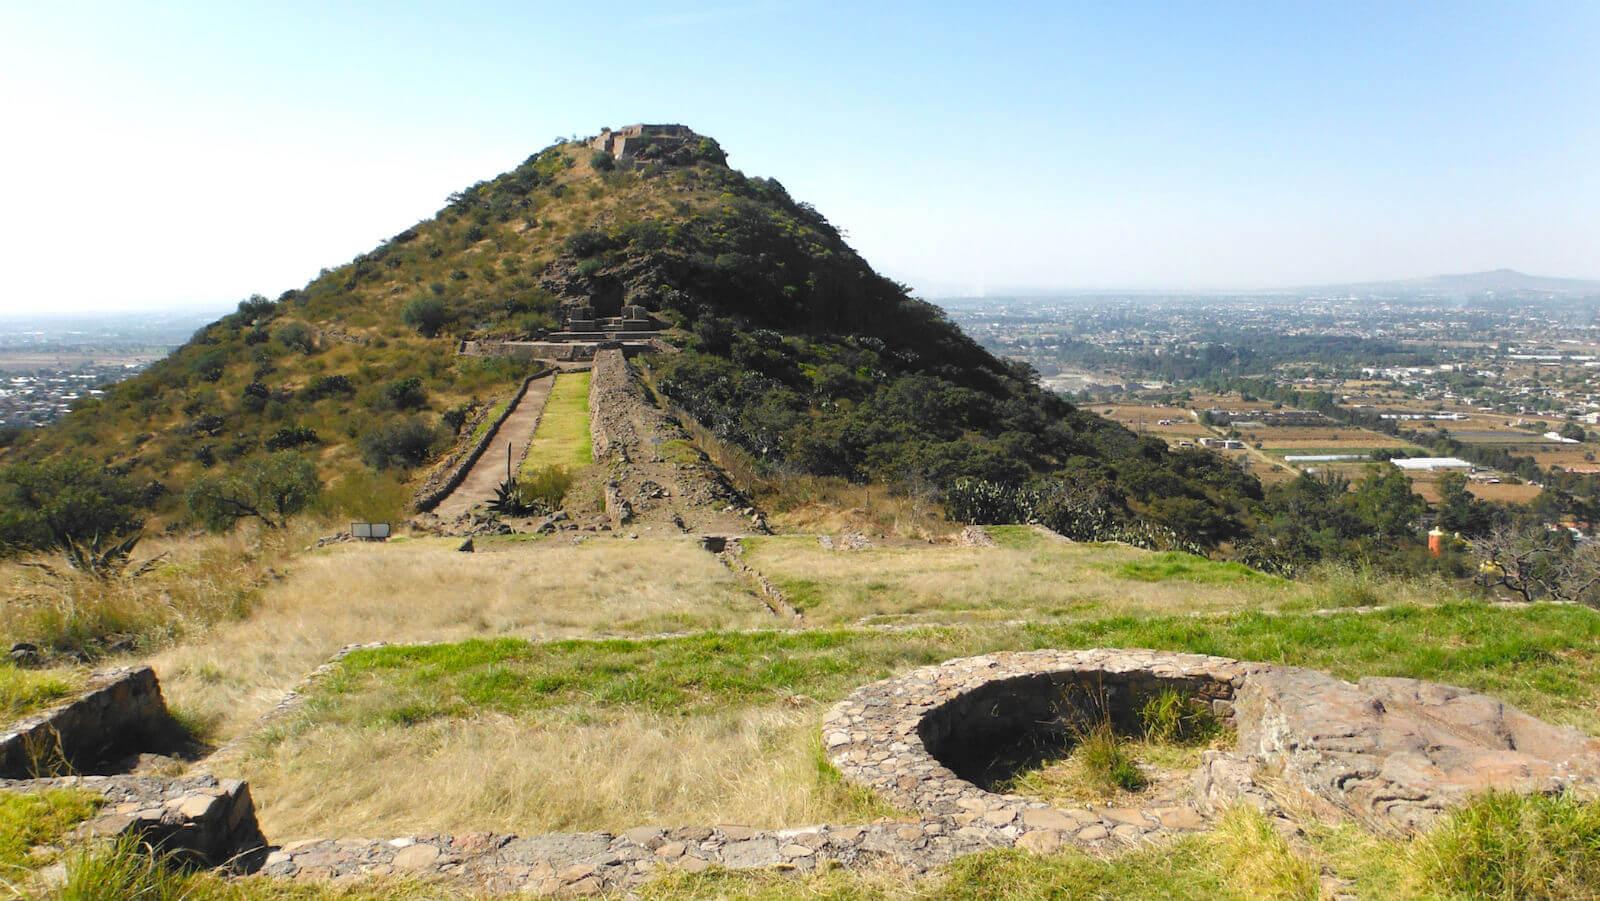 vista-panoramica-tetztoczingo-1.jpg